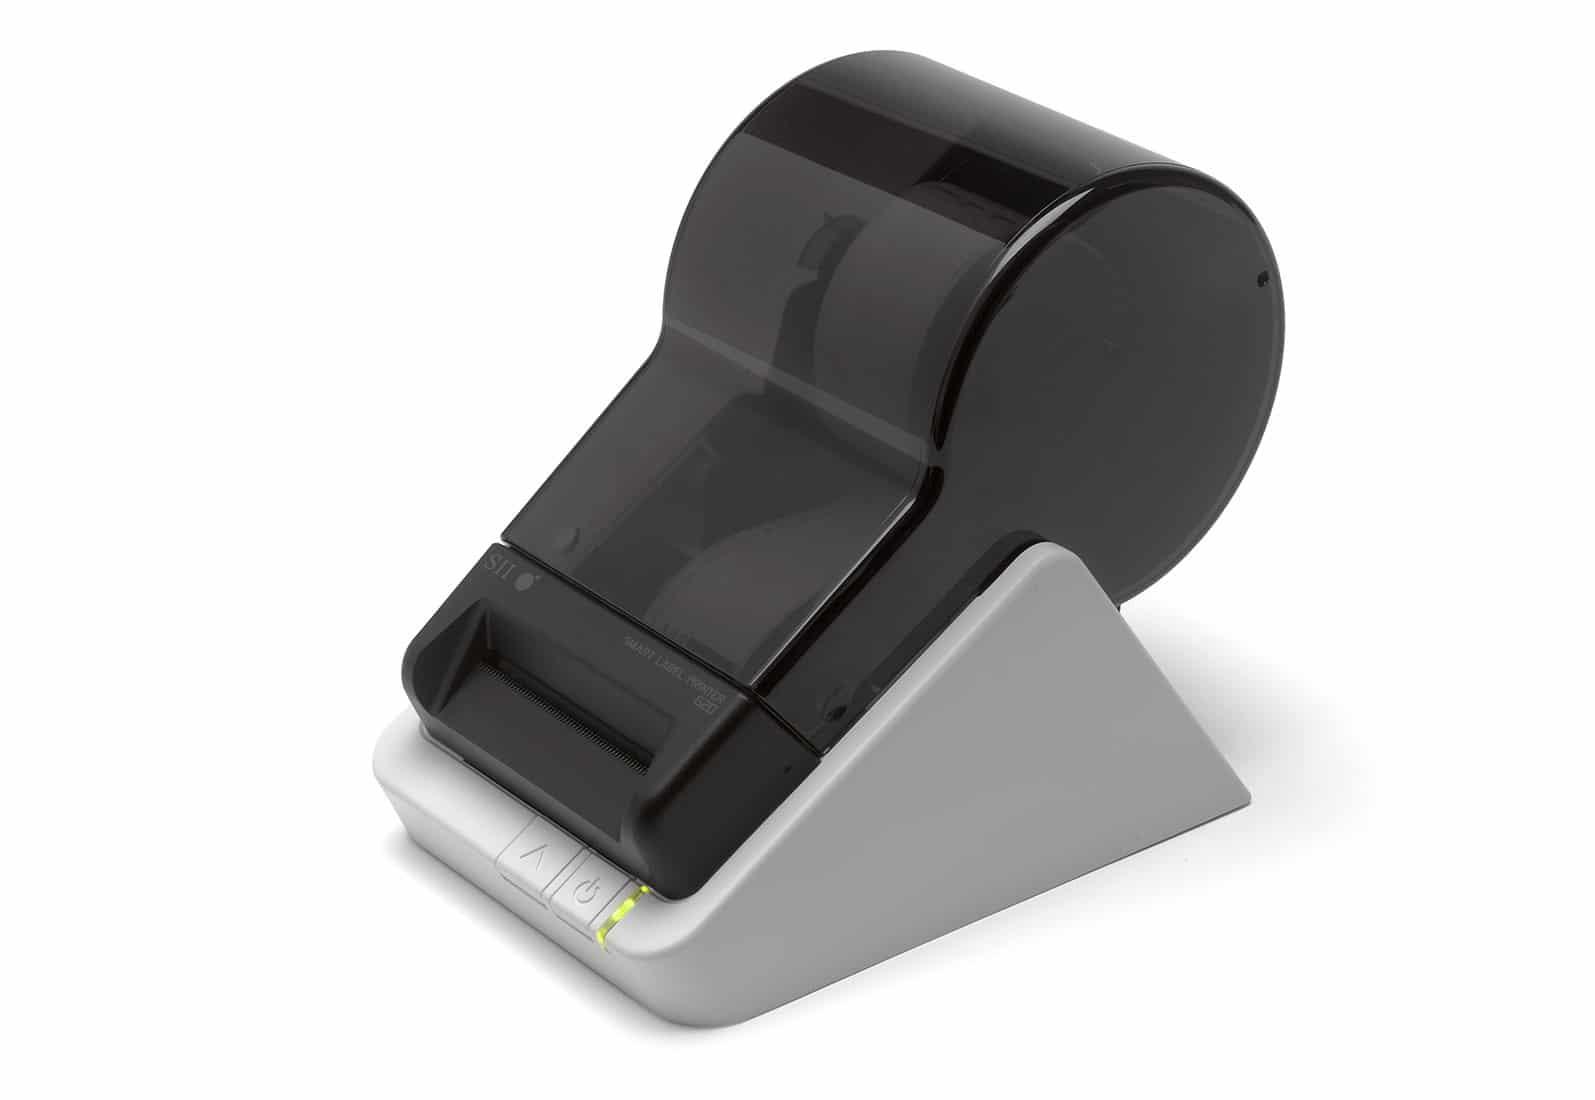 Seiko Smart Label Printer SLP-620